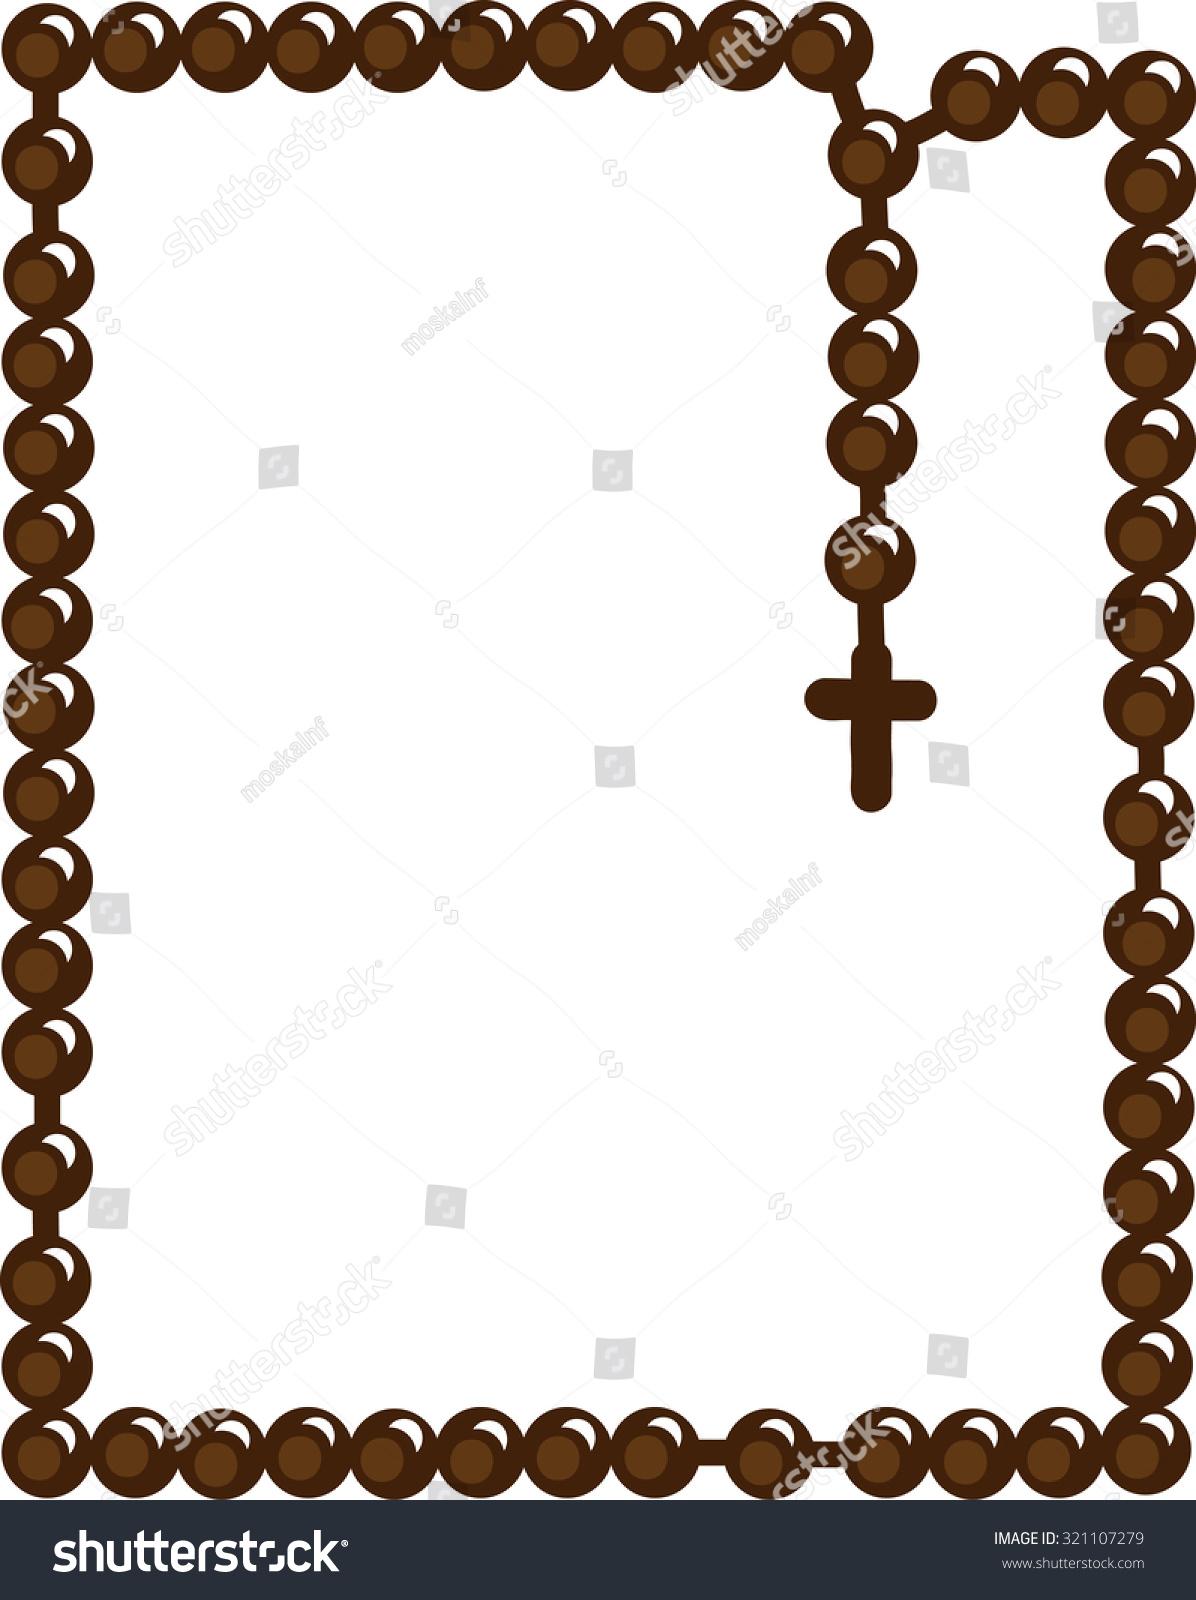 Holy rosary christian rosary symbol faith stock vector 321107279 christian rosary symbol of faith for prayer vector illustration biocorpaavc Gallery